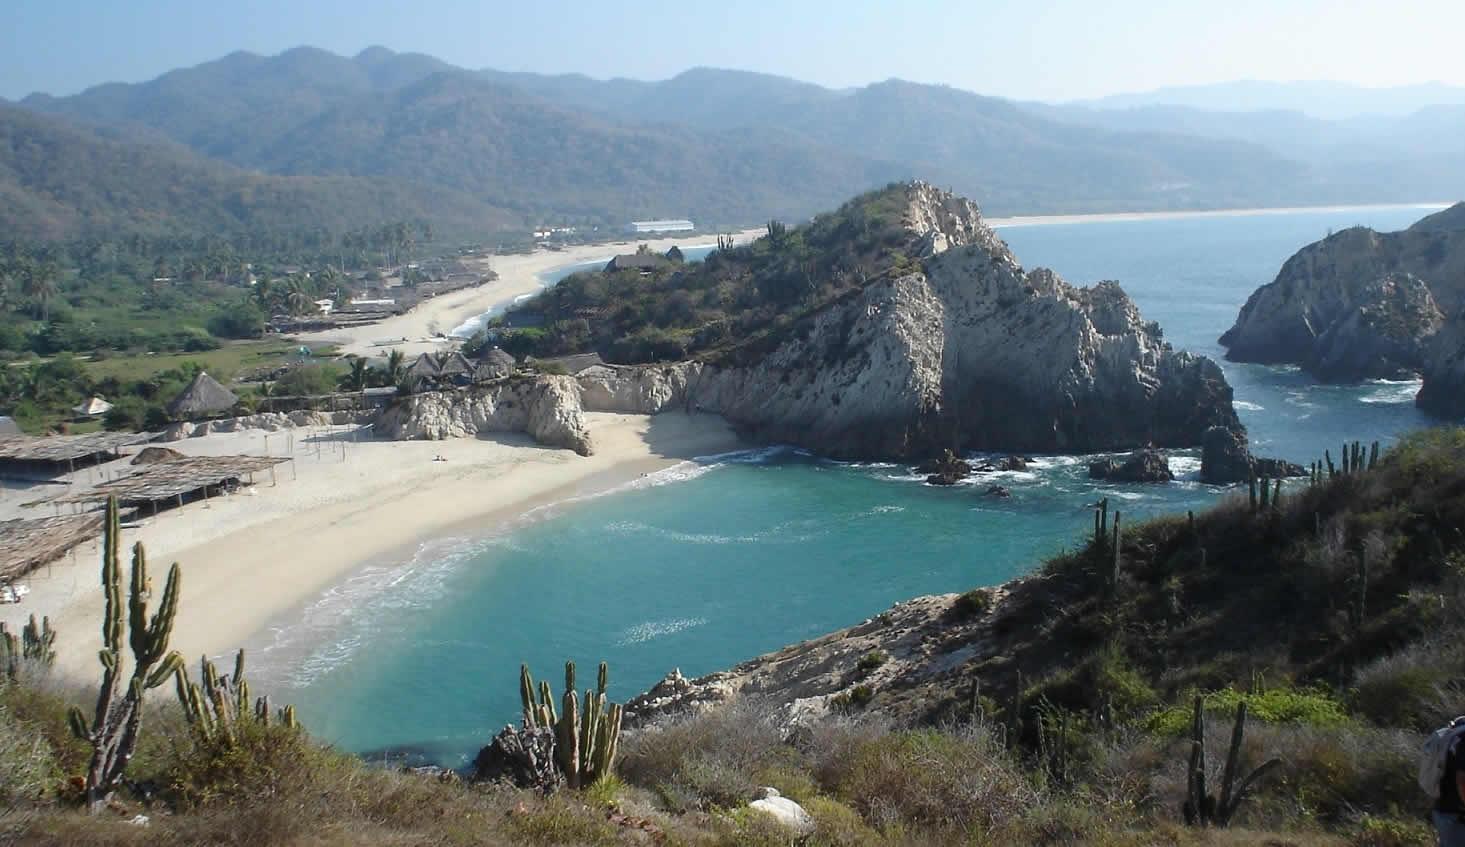 Playa Maruata Turimexico